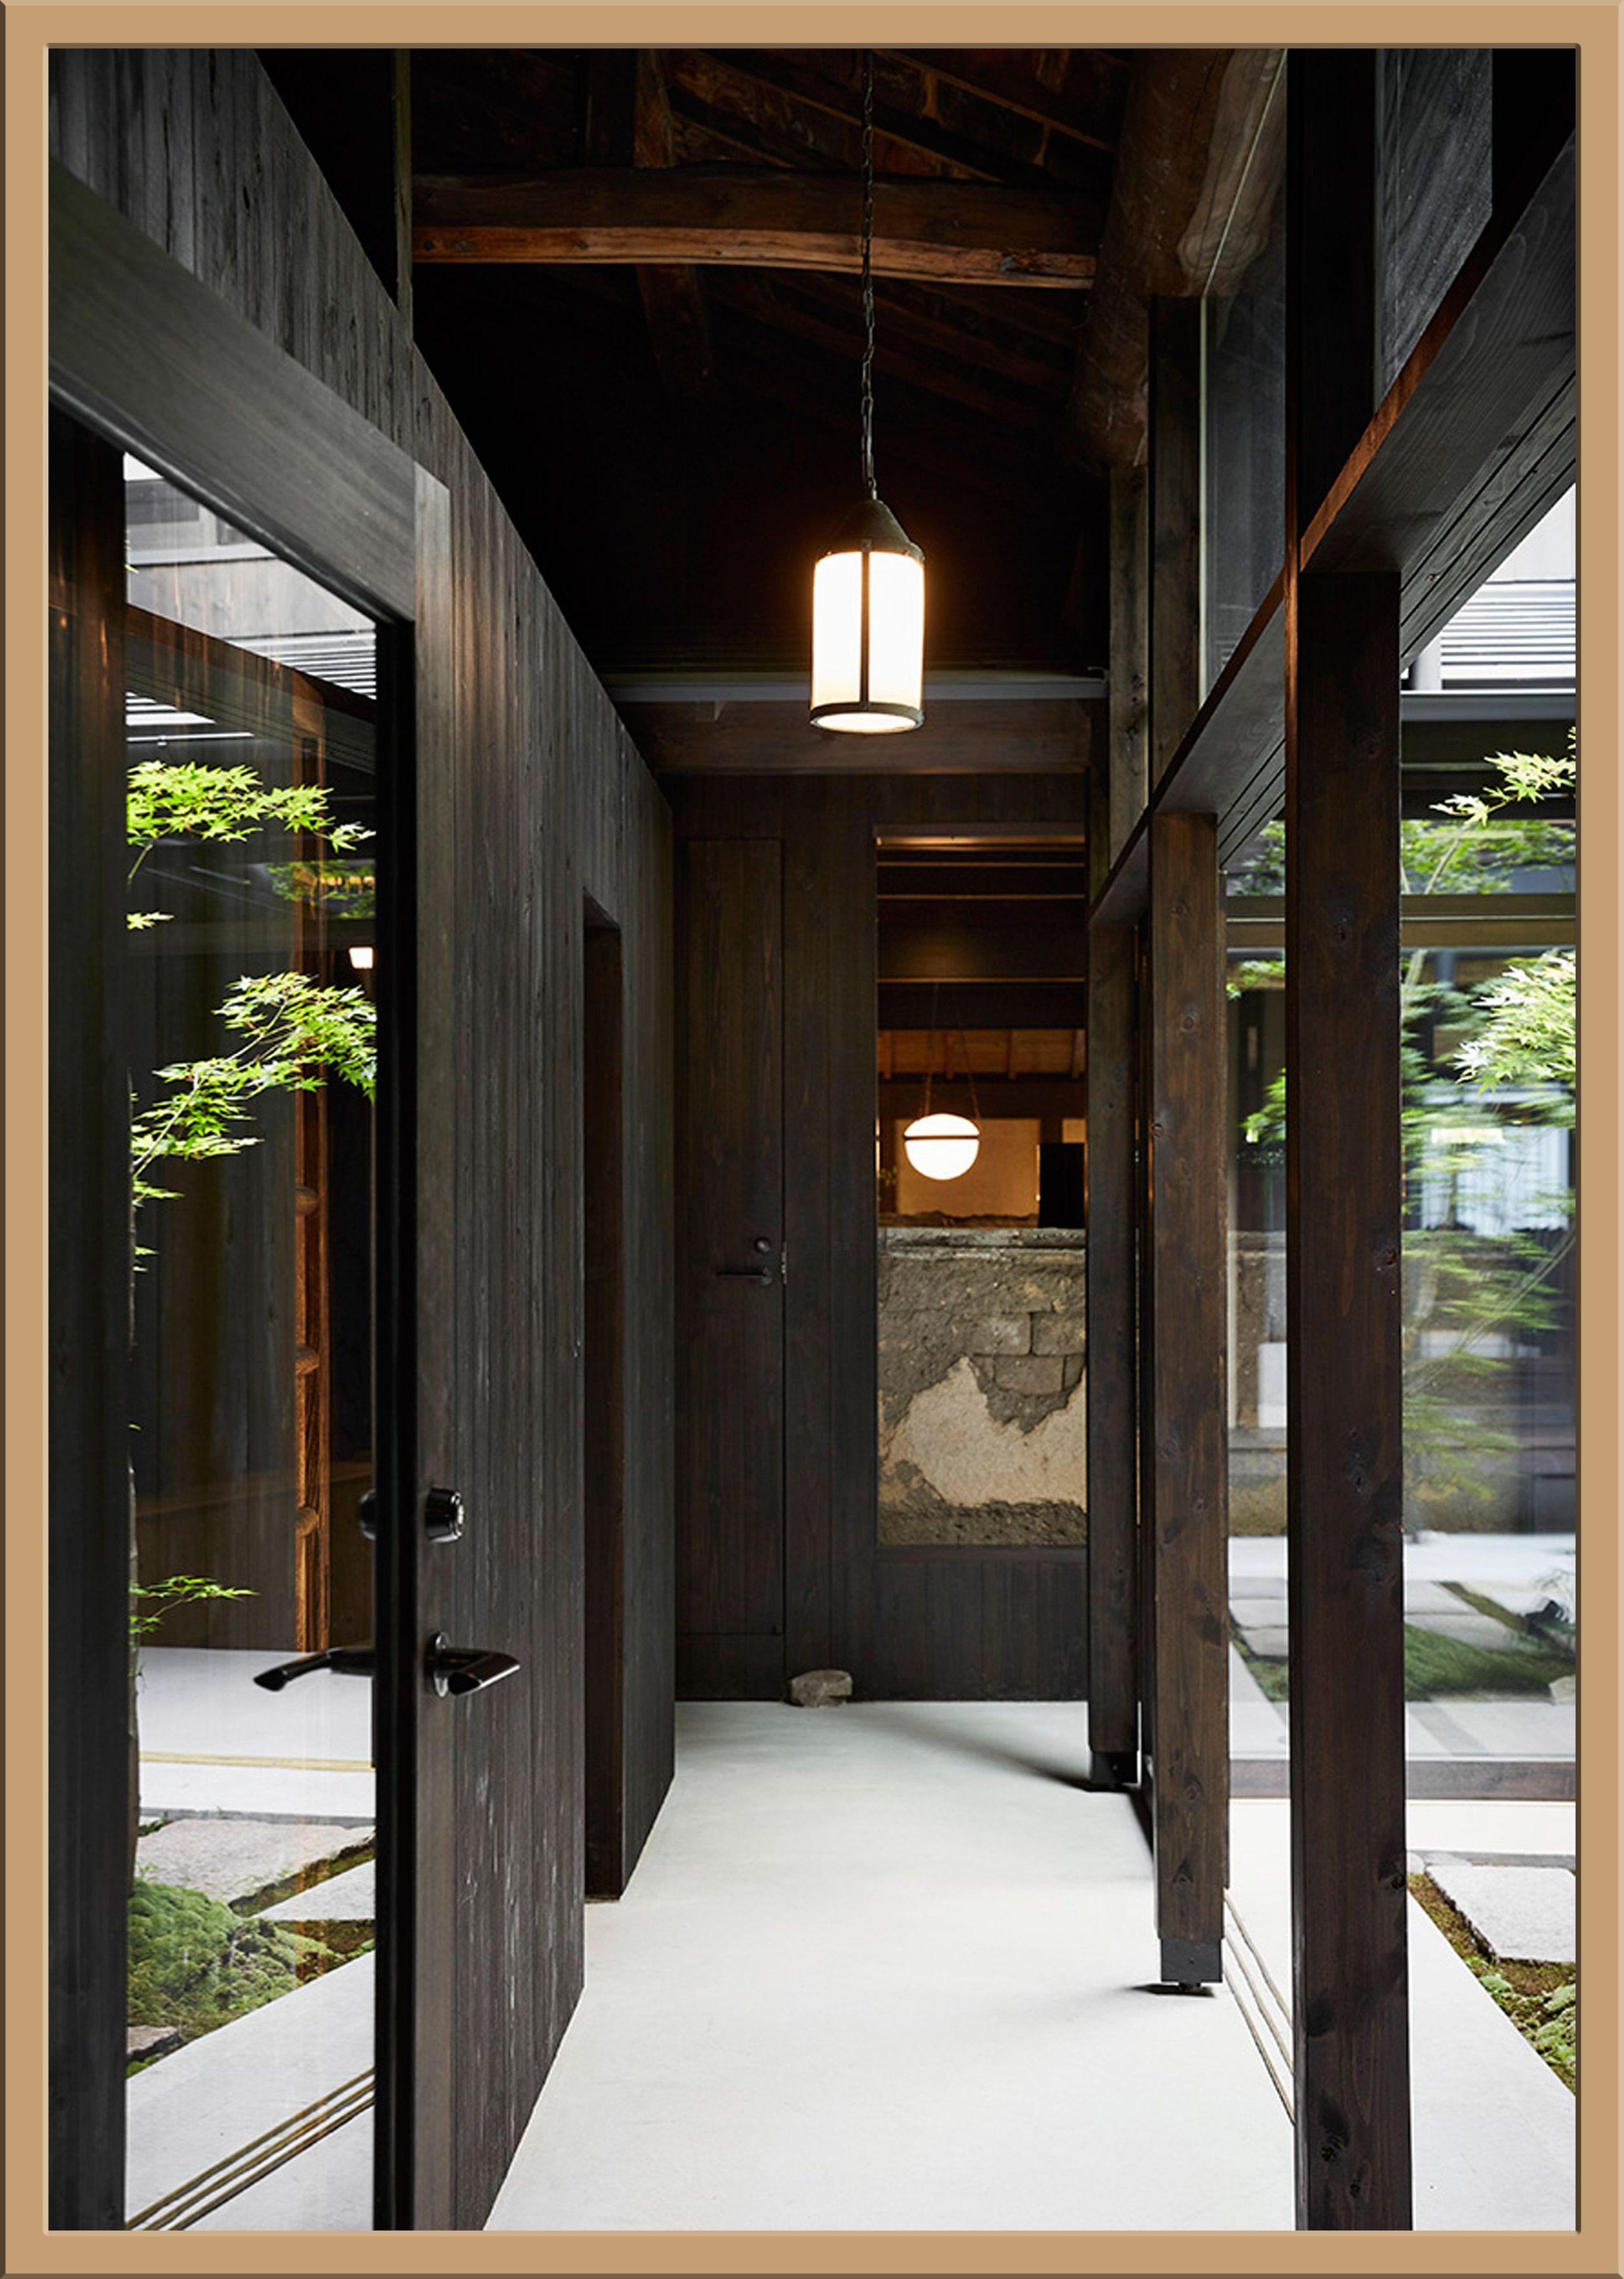 Random Interior Design Tip